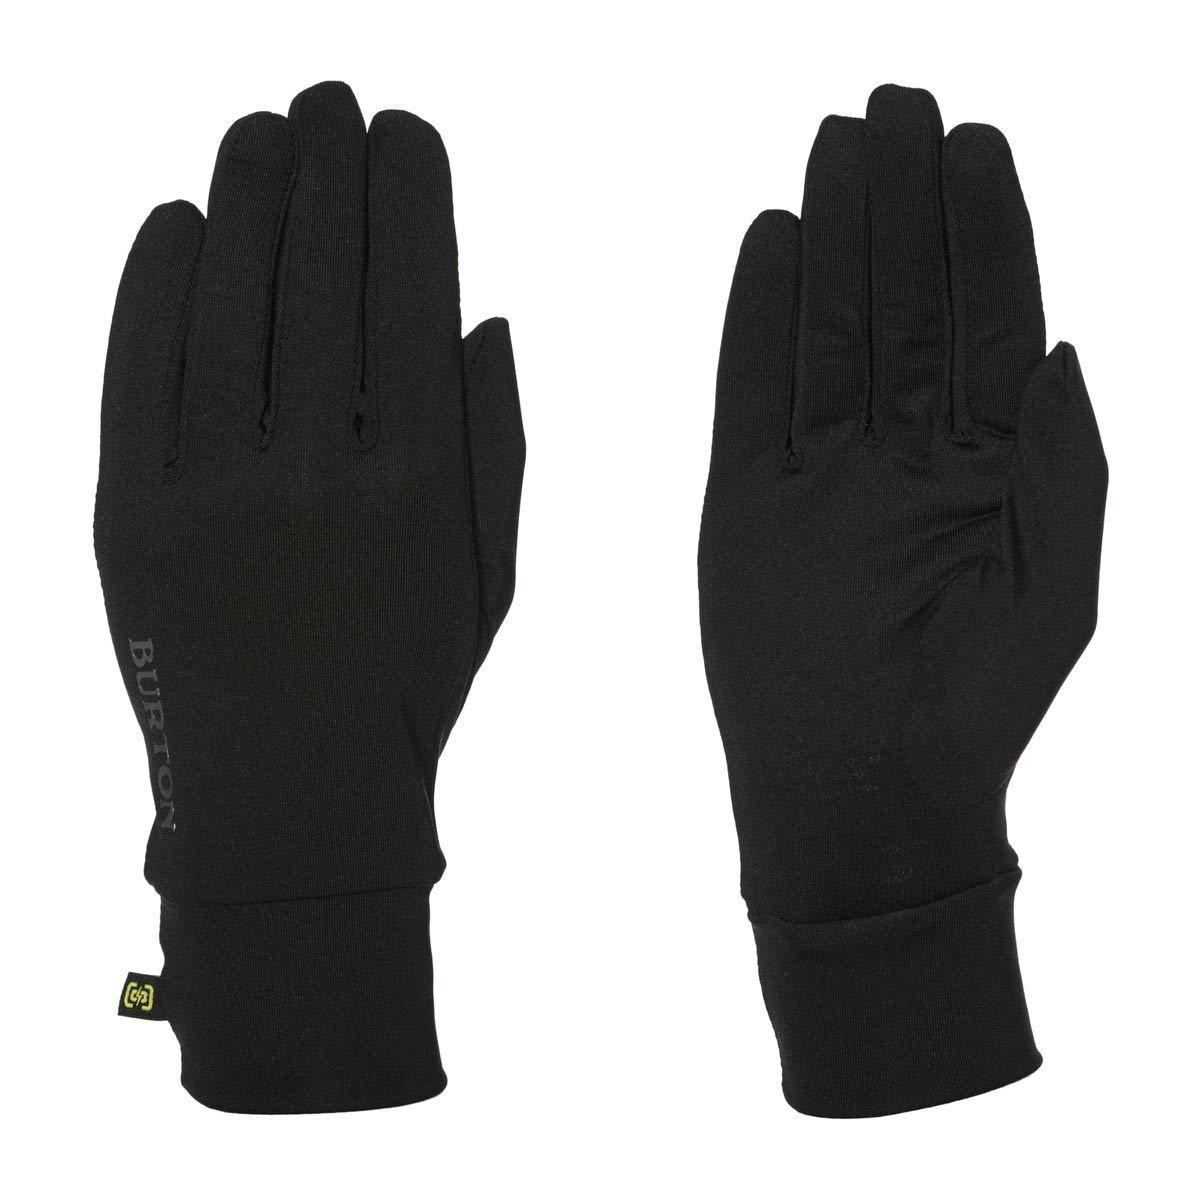 8e24e8b7d Cheap Burton Gondy Glove, find Burton Gondy Glove deals on line at ...